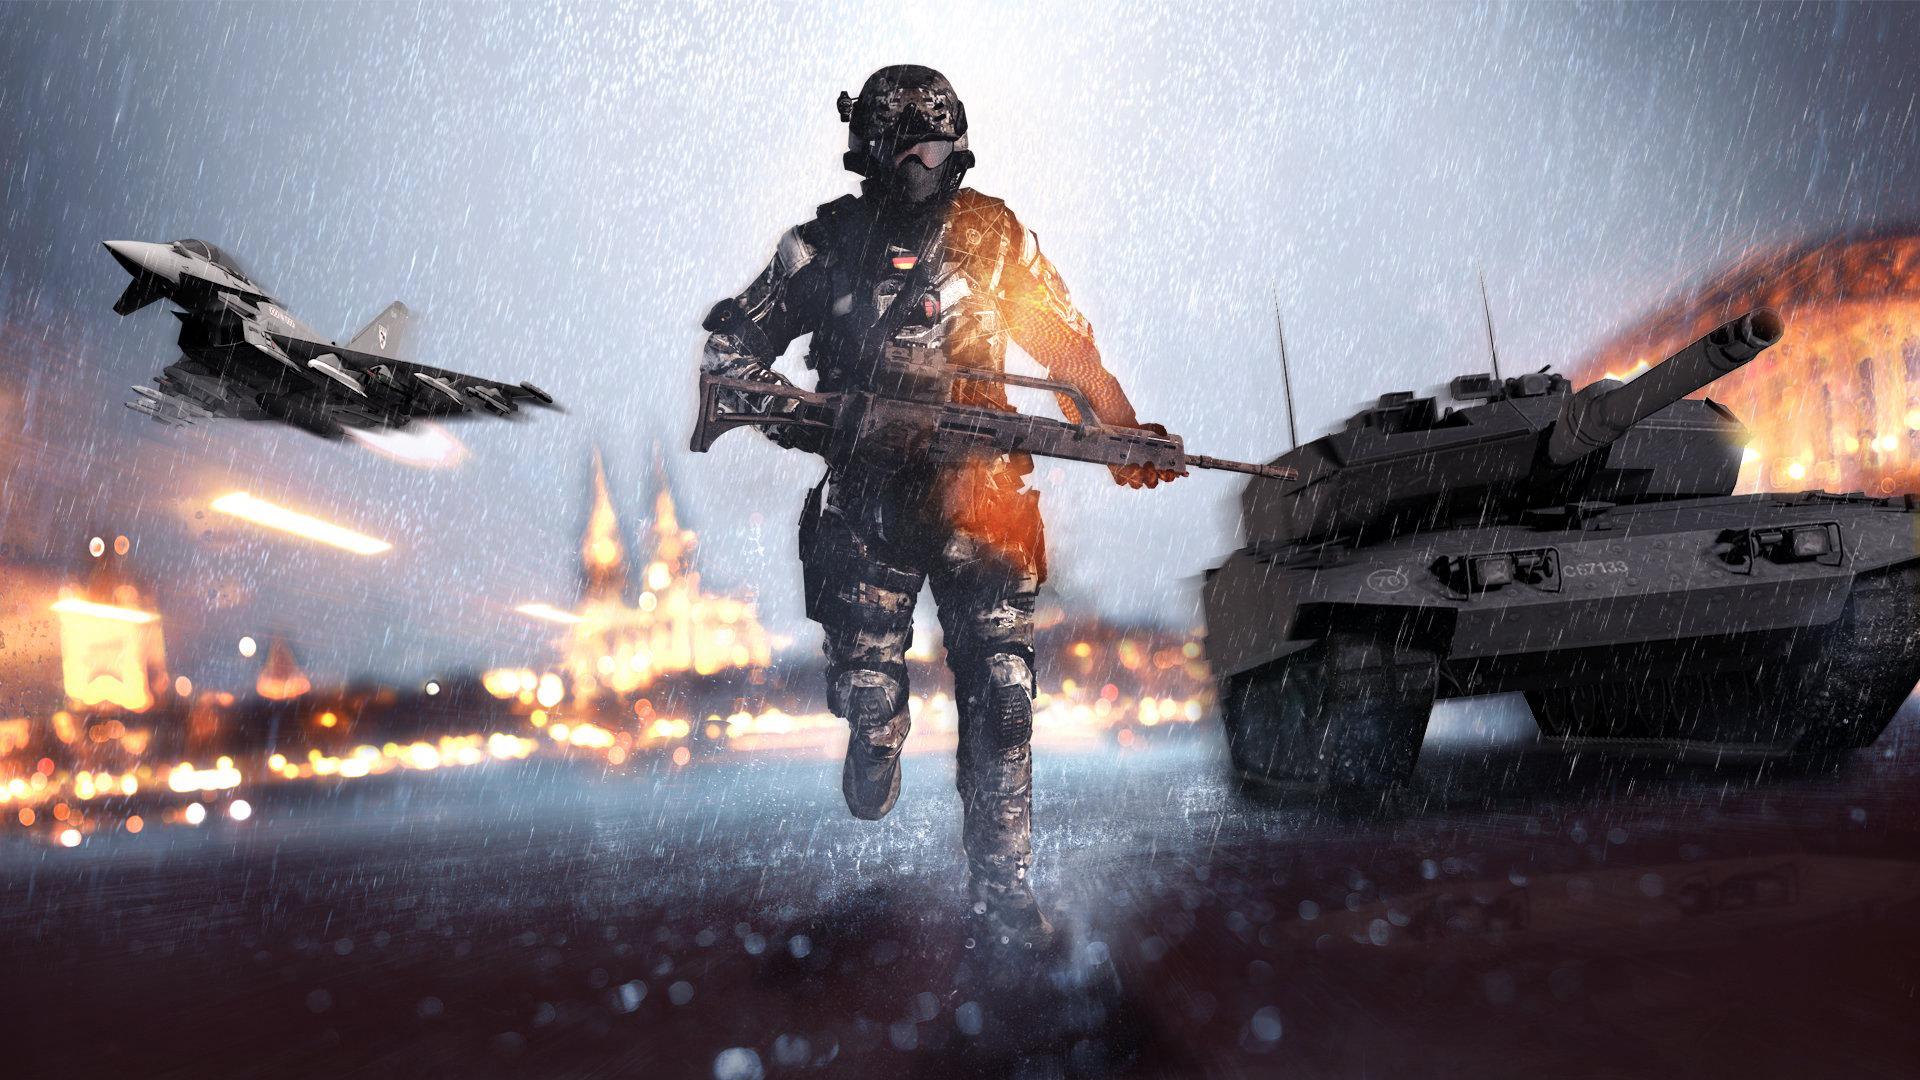 Free Battlefield 4 High Quality Wallpaper Id 498288 For Full Hd